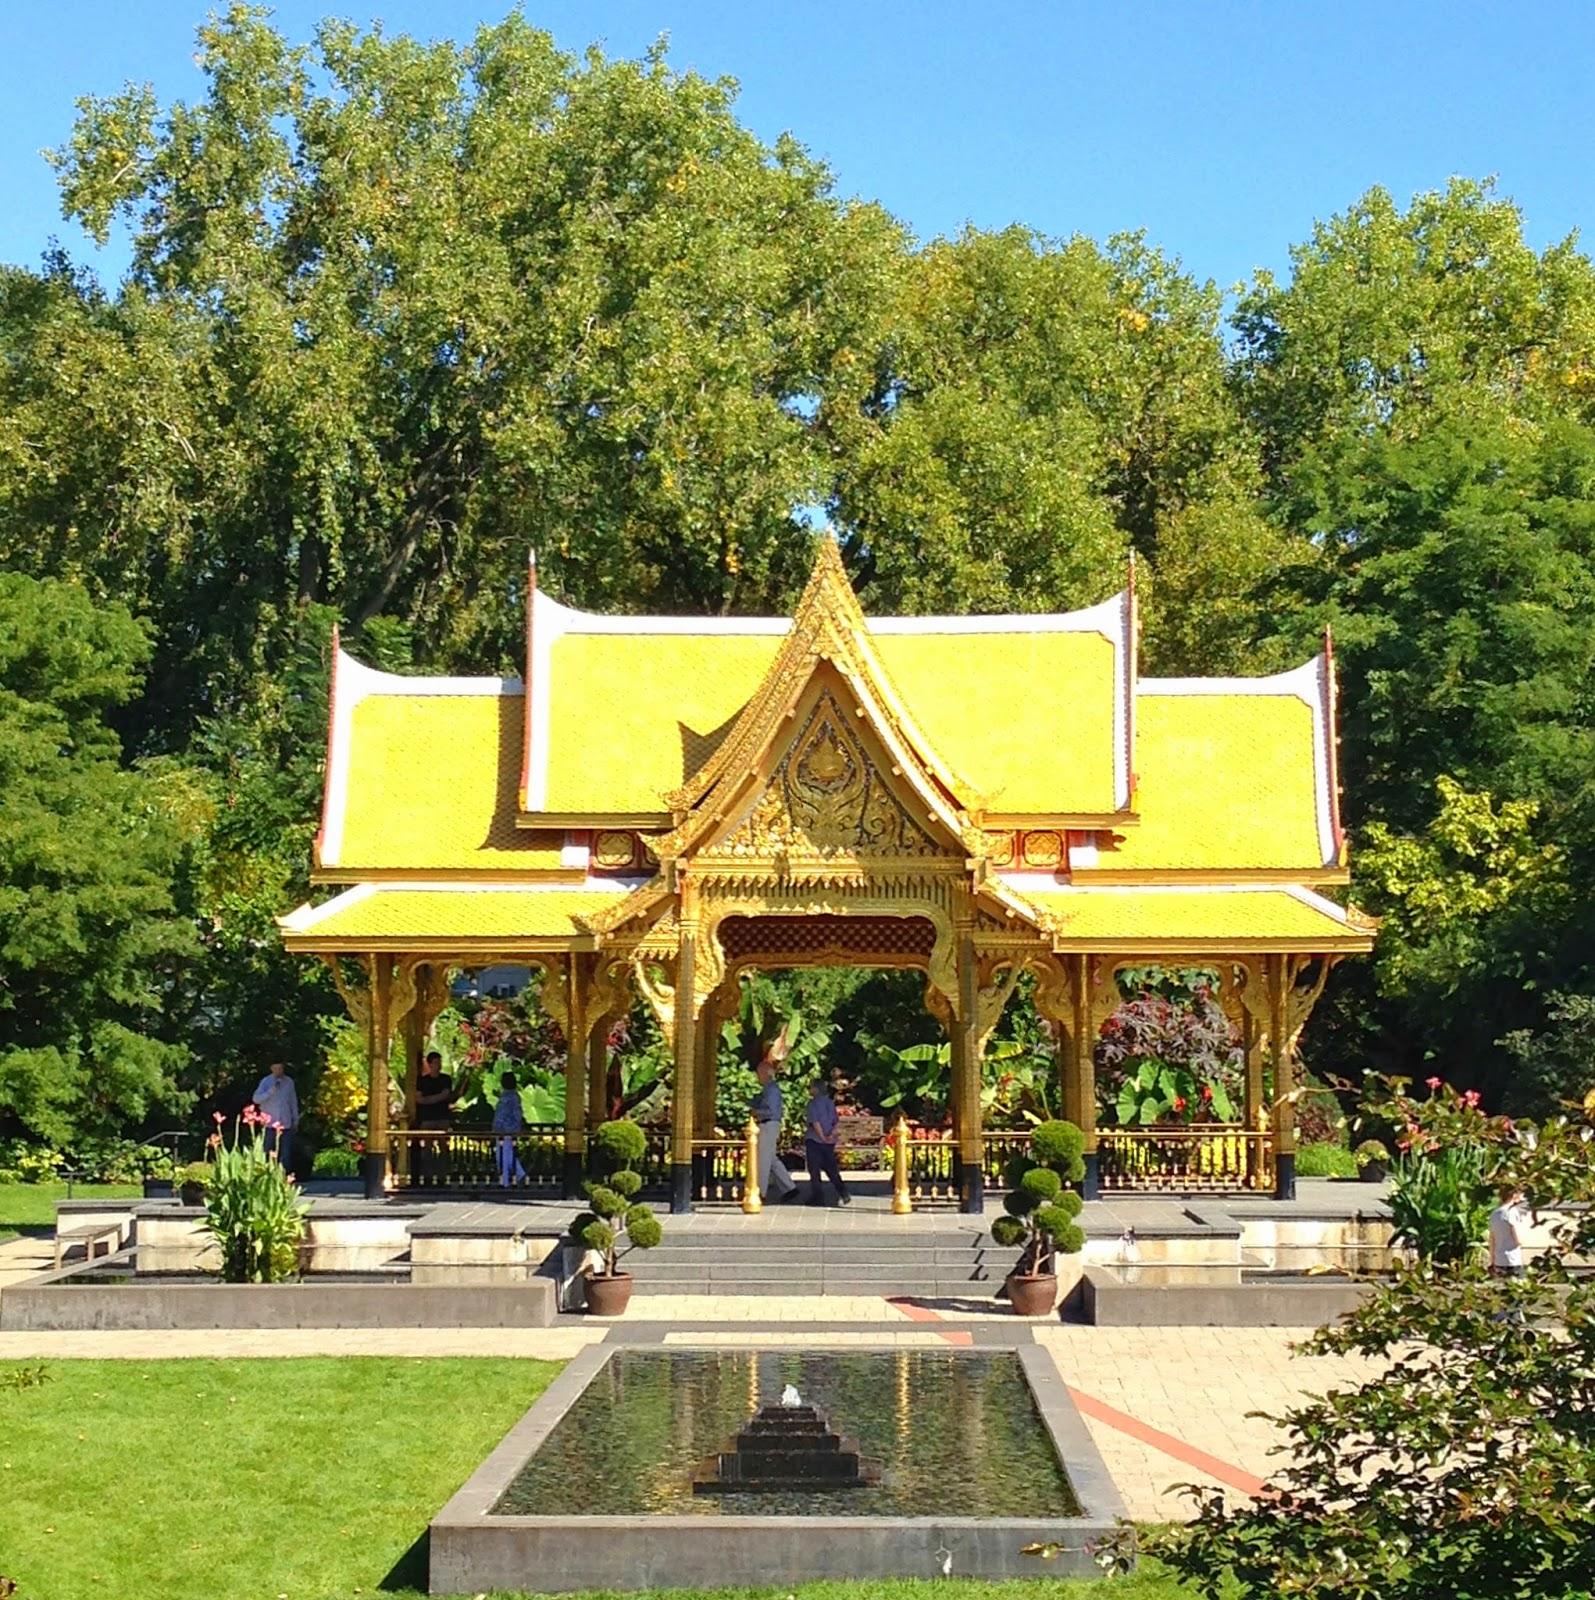 Ageless Traveler: The Enchanting Olbrich Gardens